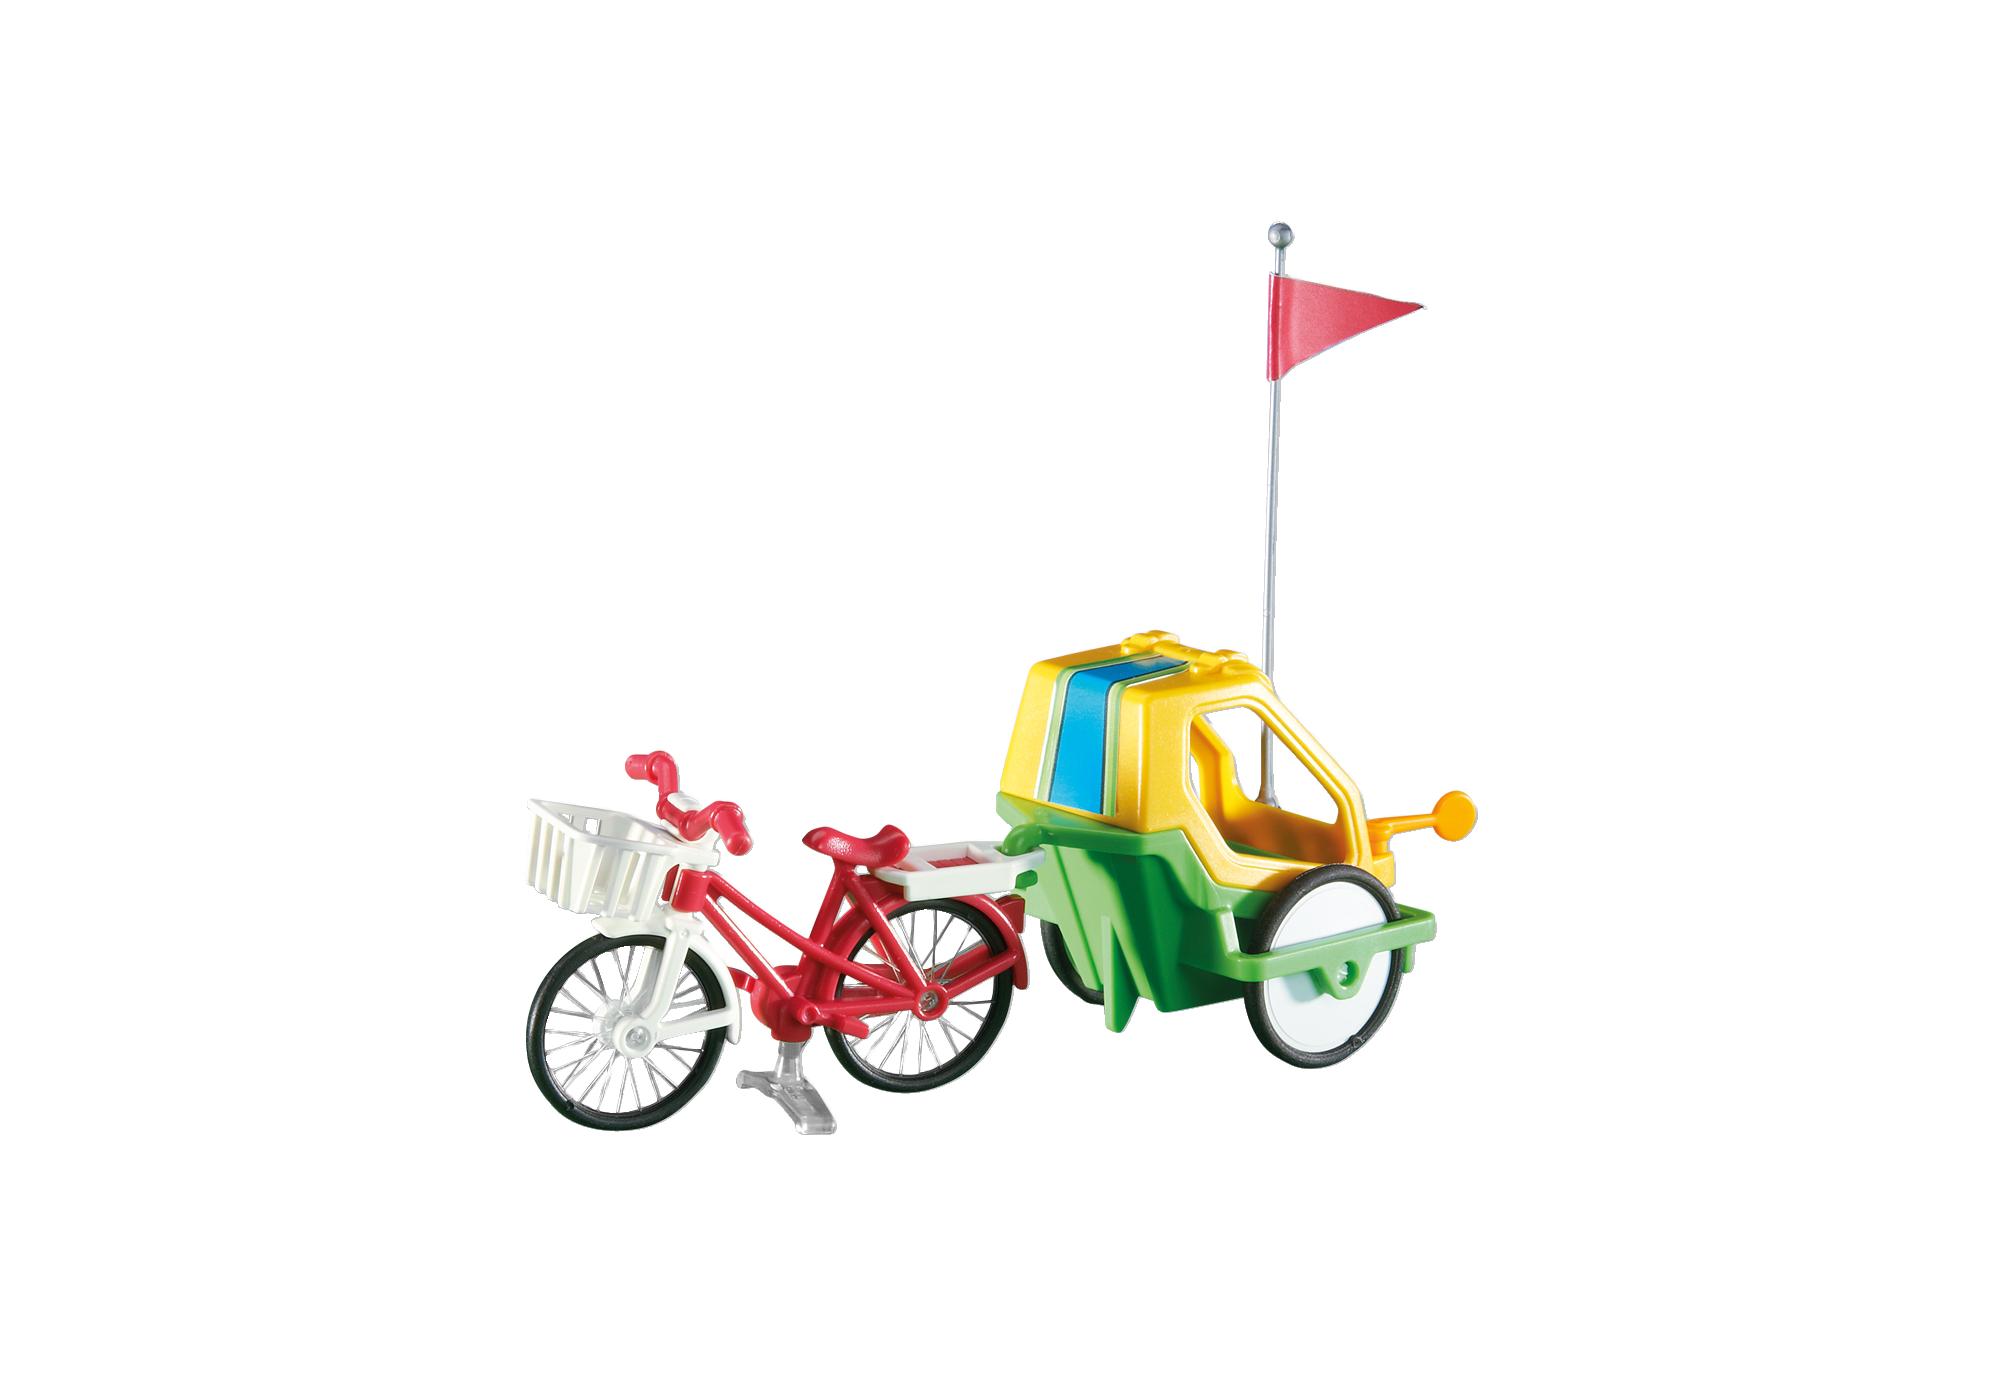 http://media.playmobil.com/i/playmobil/6388_product_detail/Cykel med cykelanhænger til børn